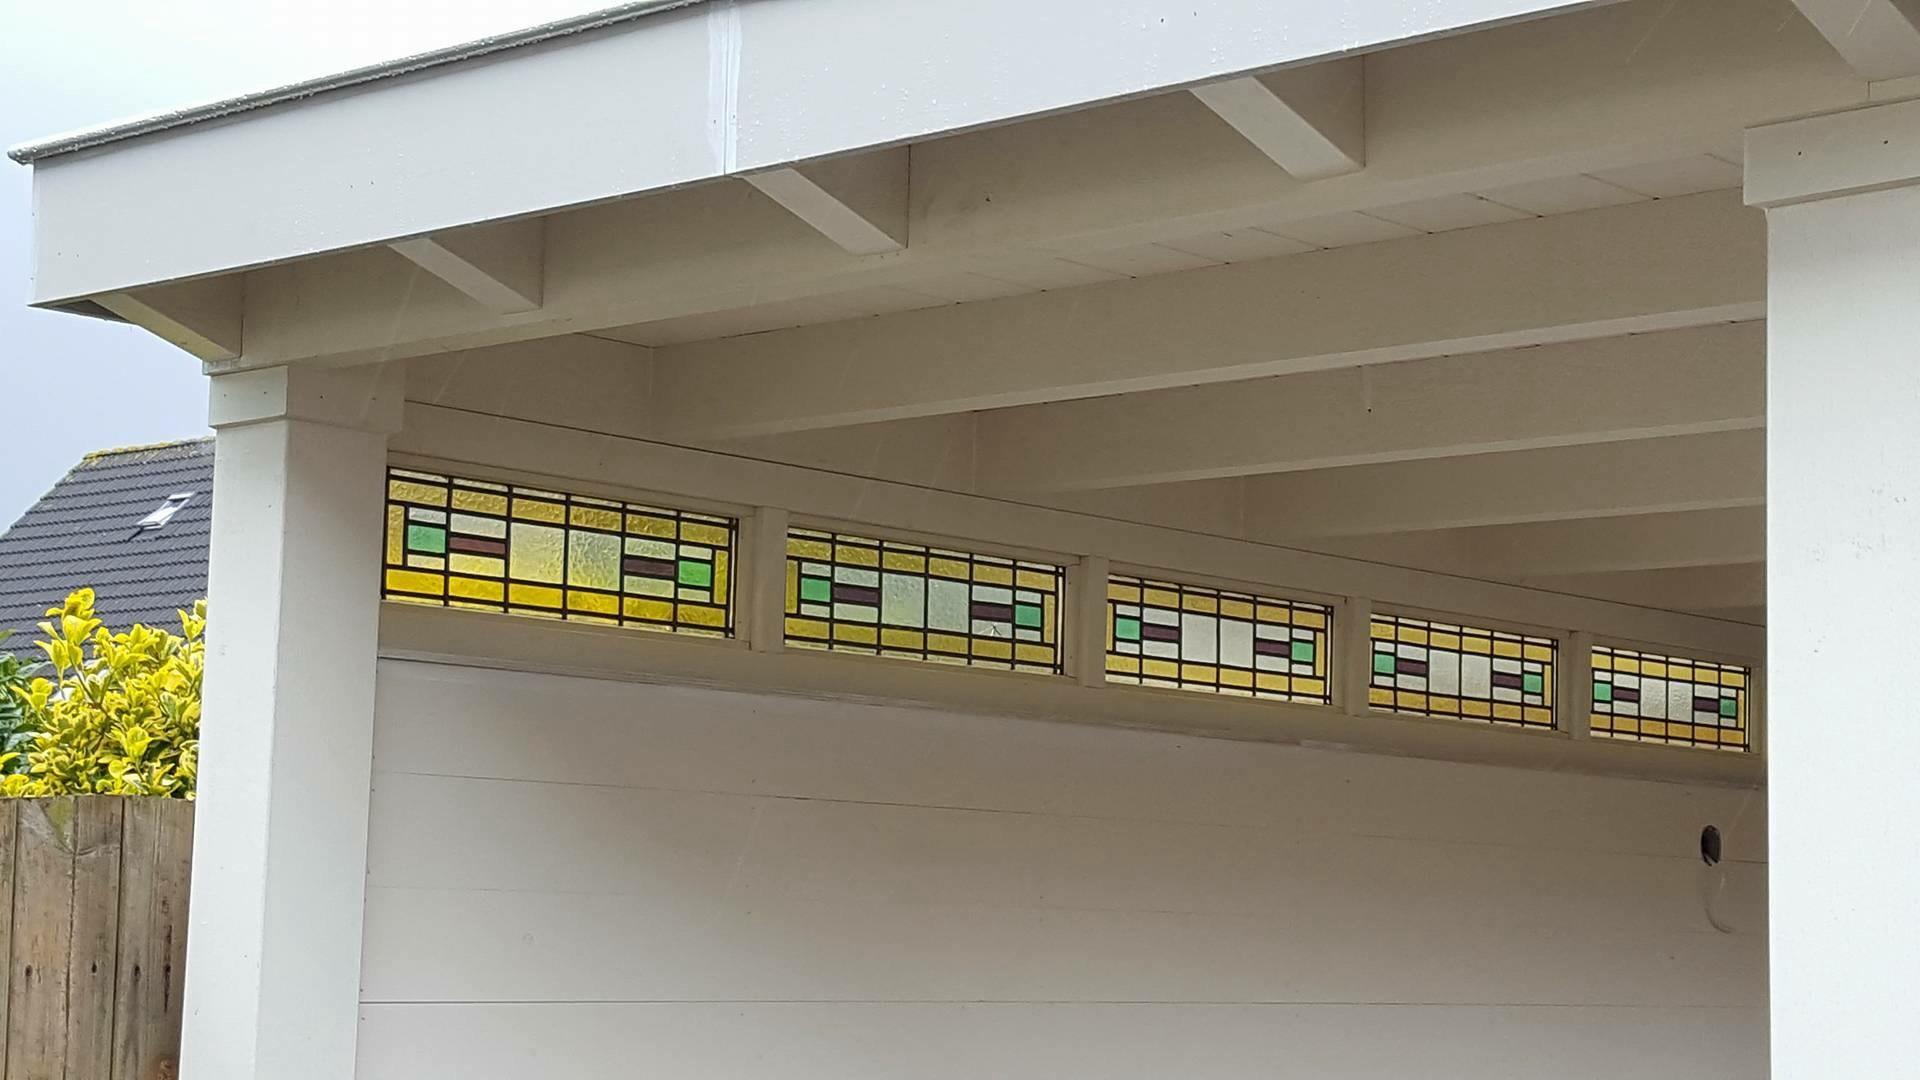 Bovenlicht met glas in lood